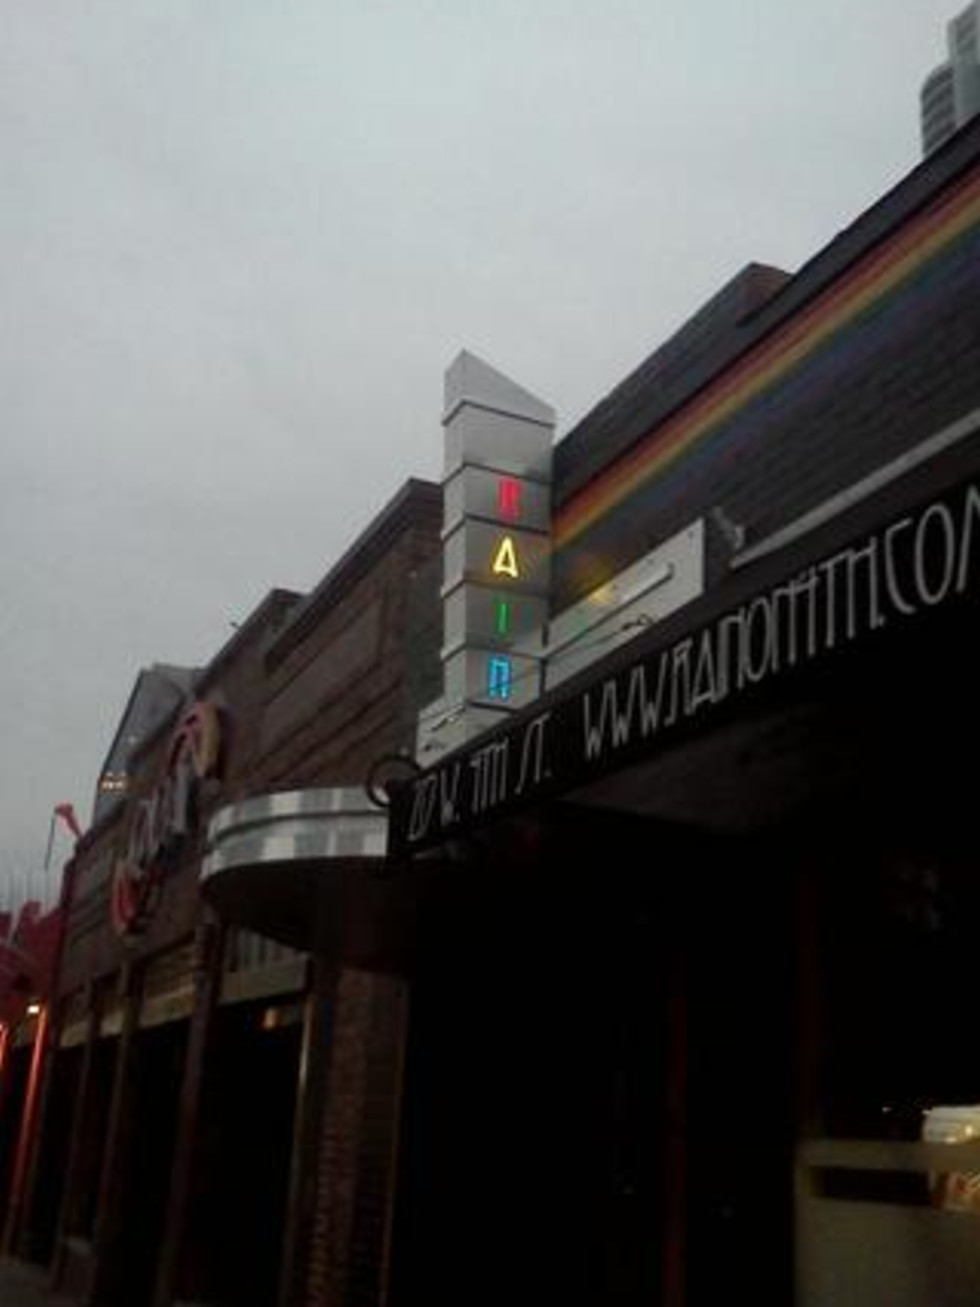 Austin_photo: places_drinks_rain_exterior